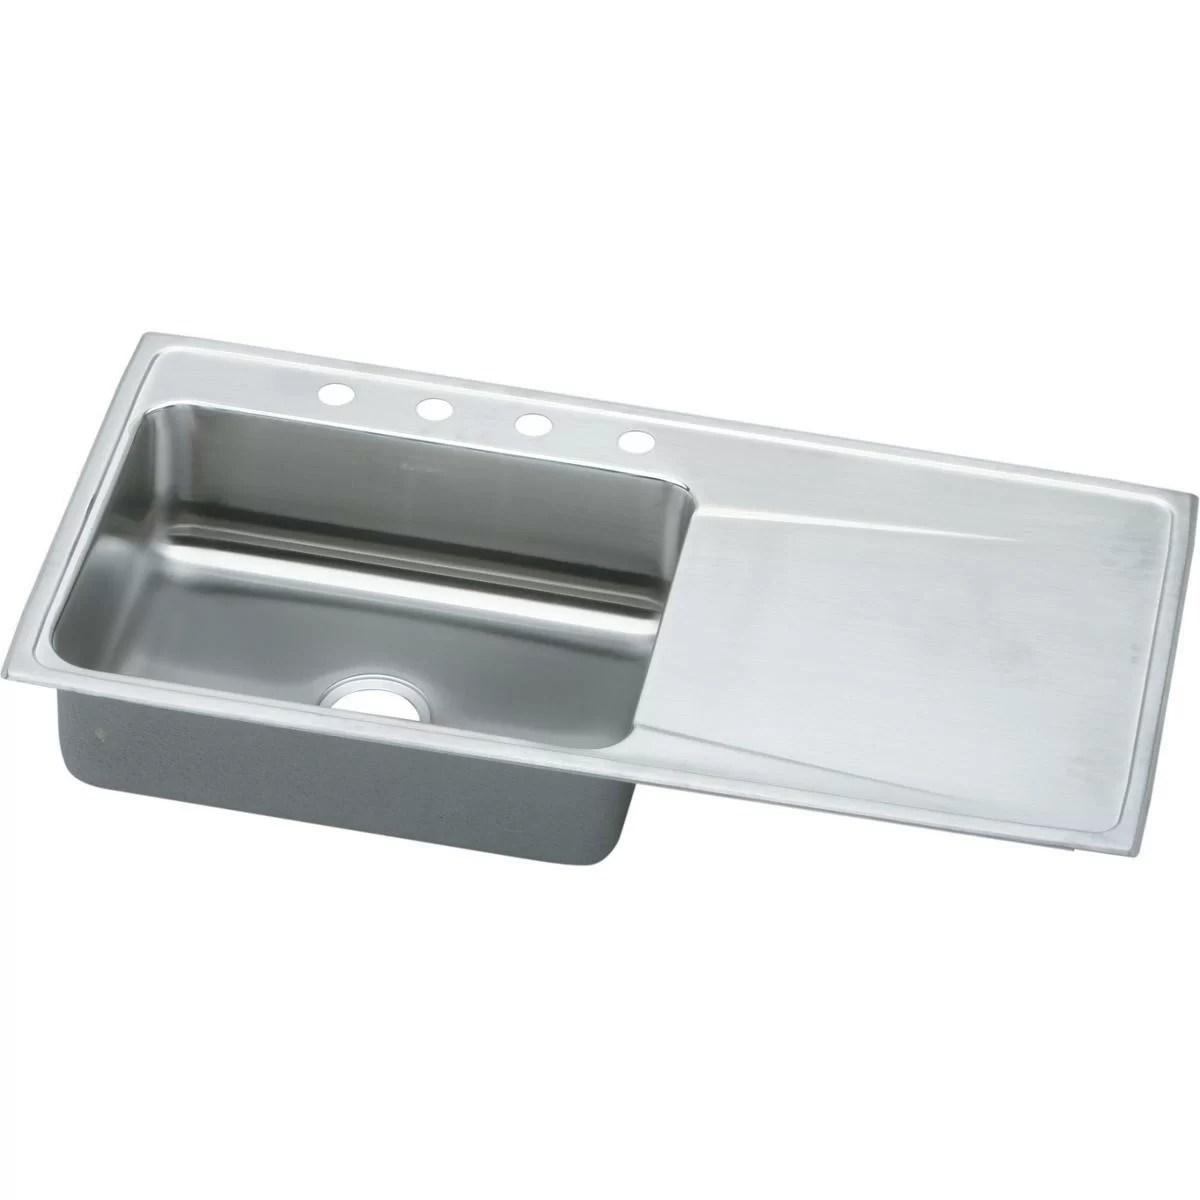 lustertone 43 l x 22 w drop in kitchen sink with drainboard